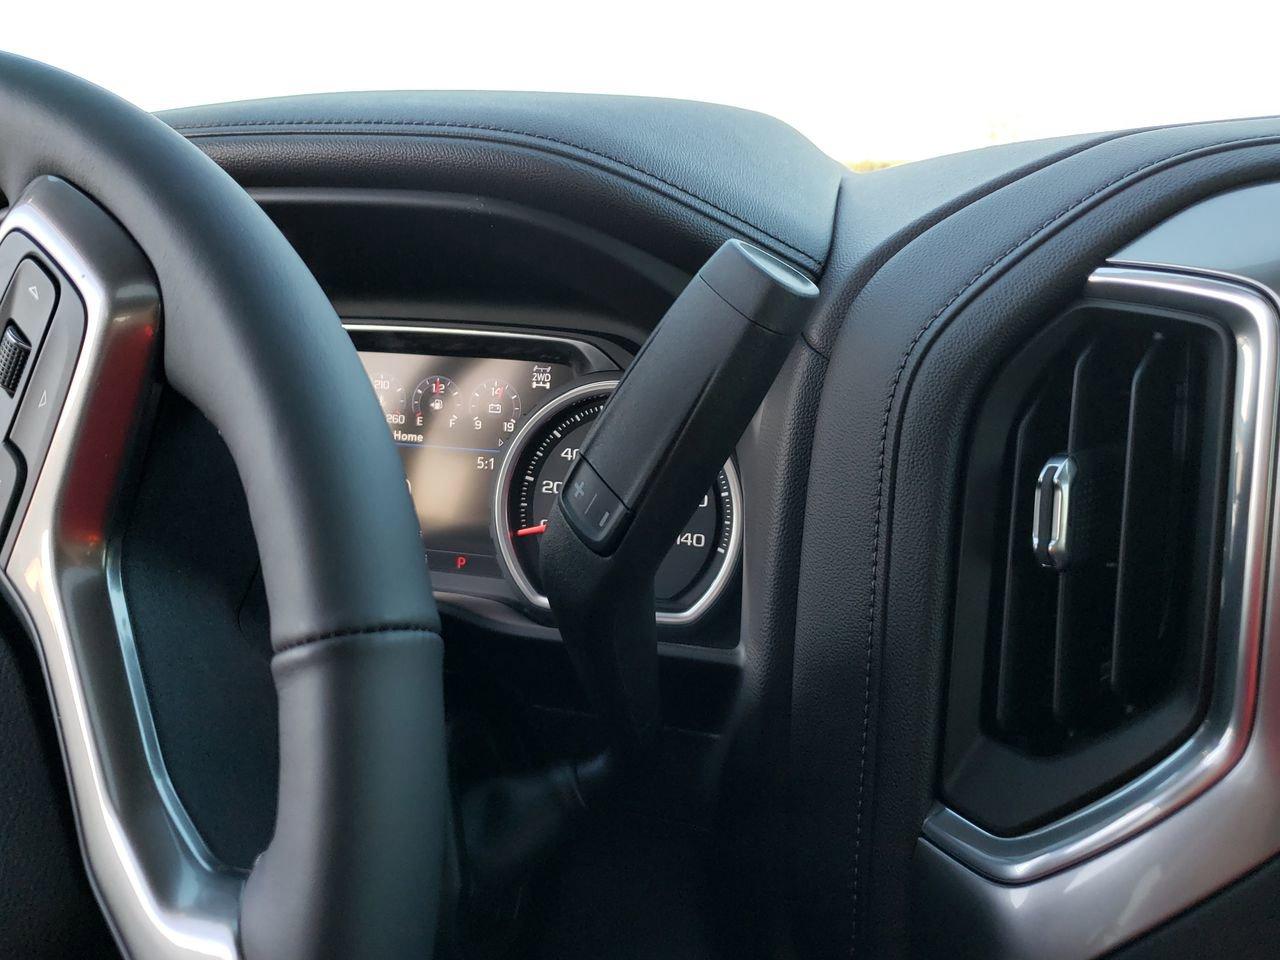 New 2020 Chevrolet Silverado 2500HD LTZ